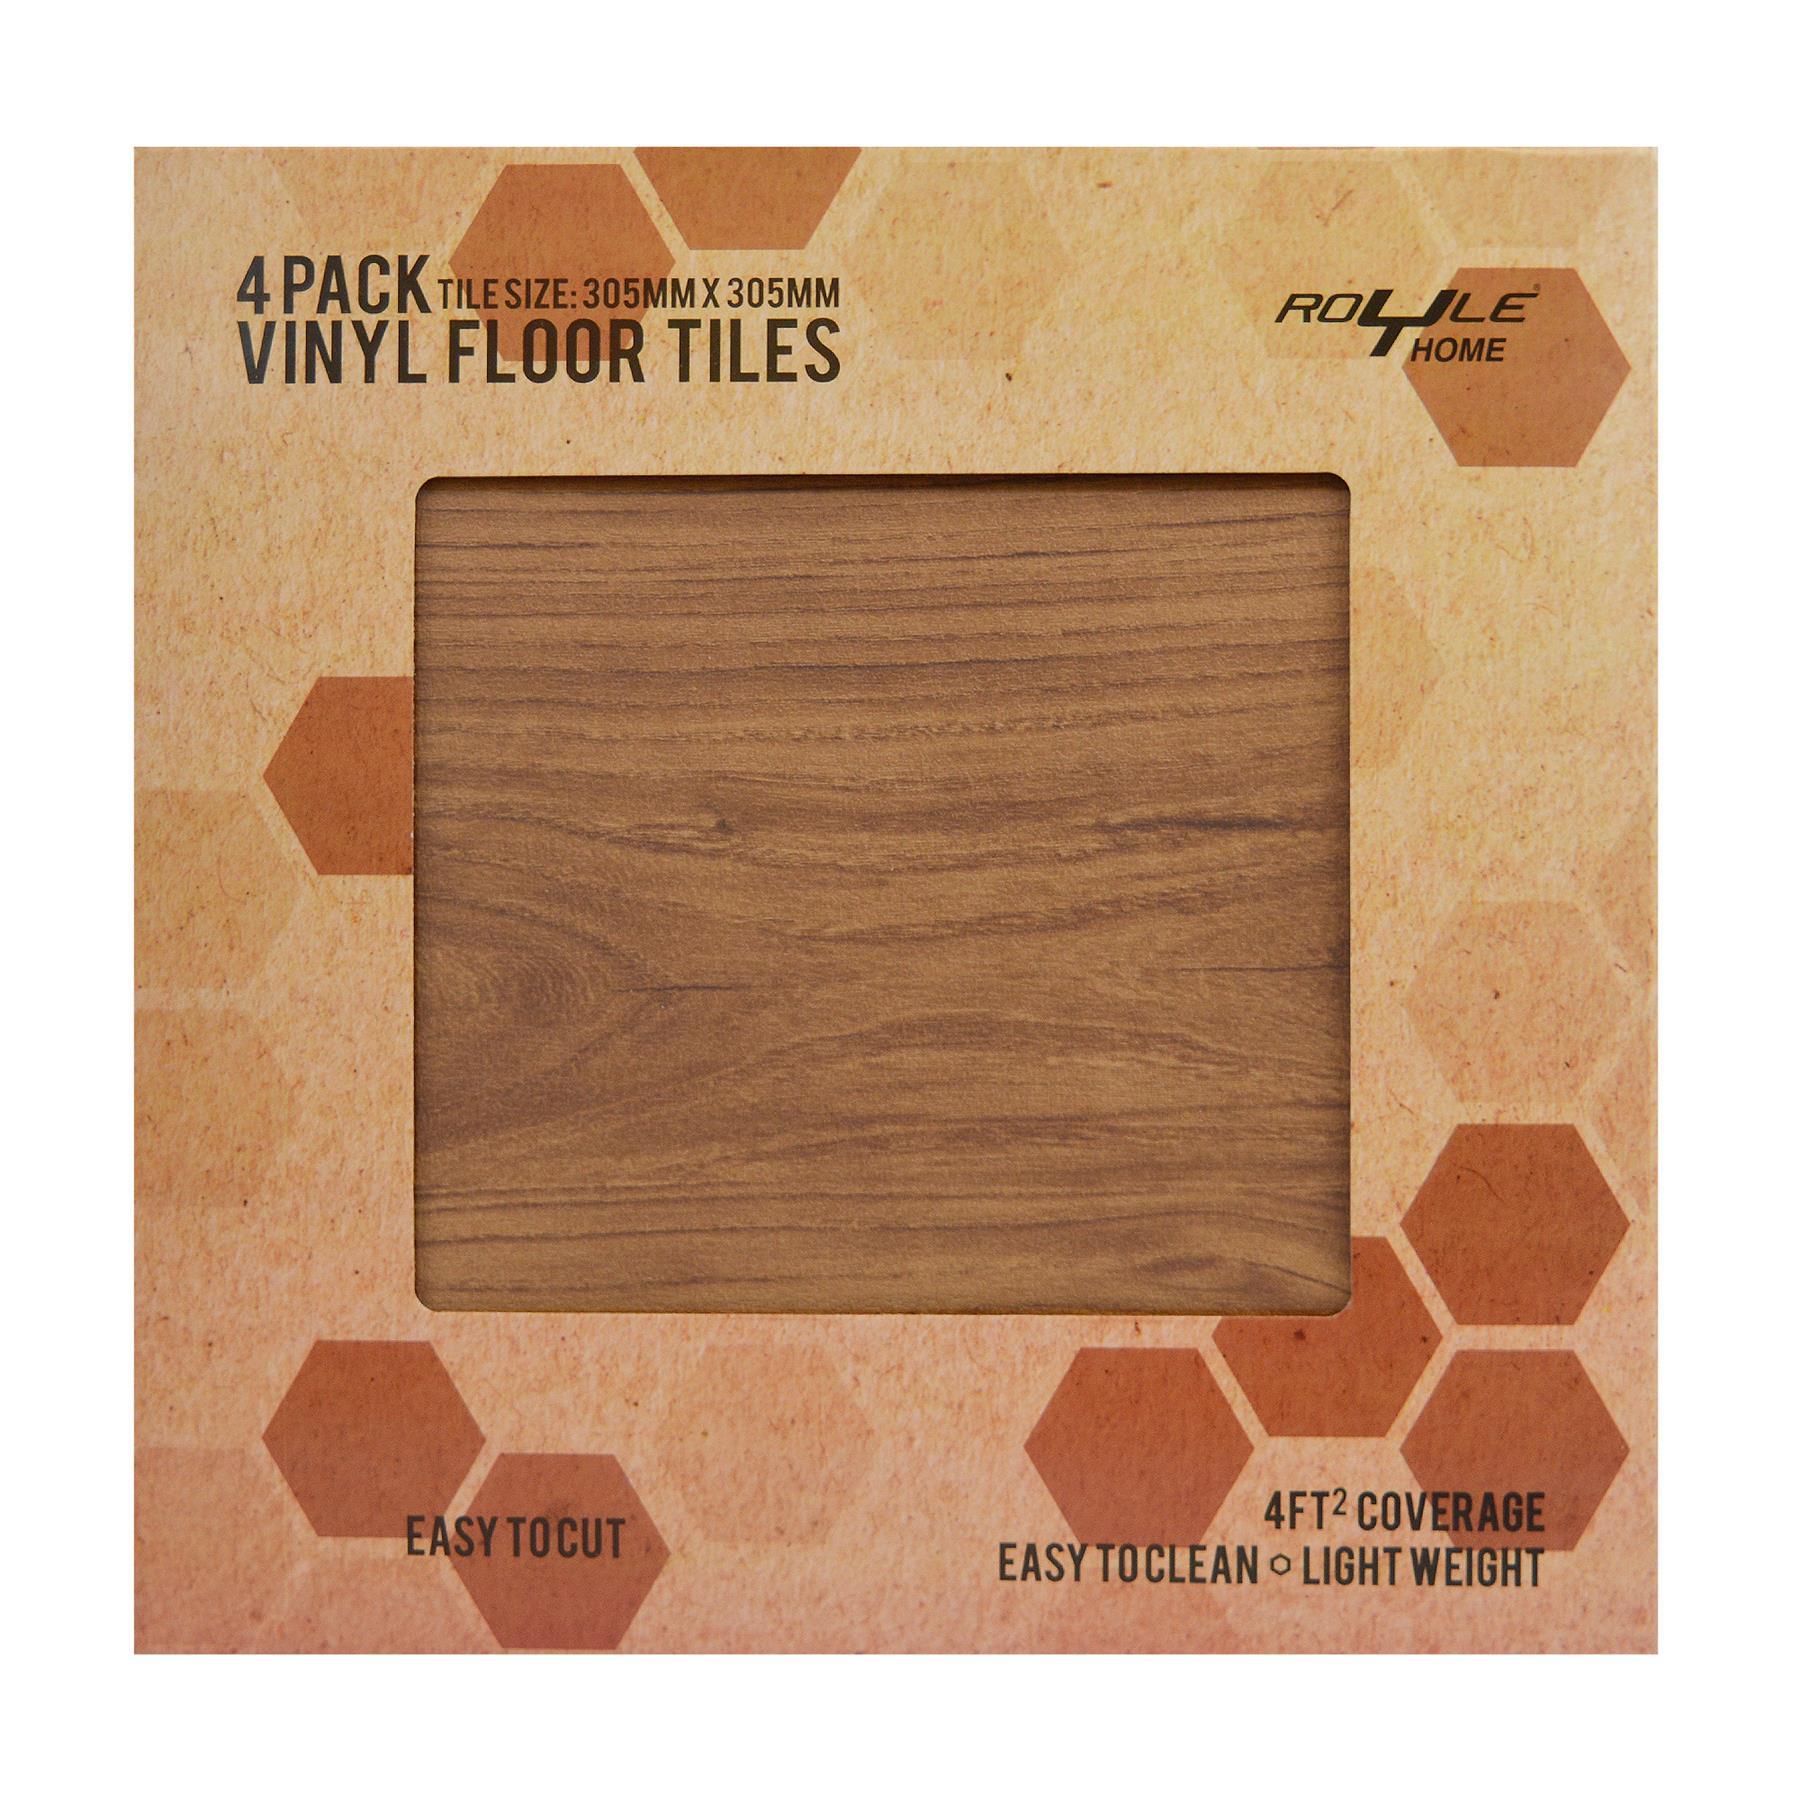 Floor-Tiles-Self-Adhesive-Vinyl-Flooring-Kitchen-Bathroom-Brown-Wood-Grain thumbnail 10